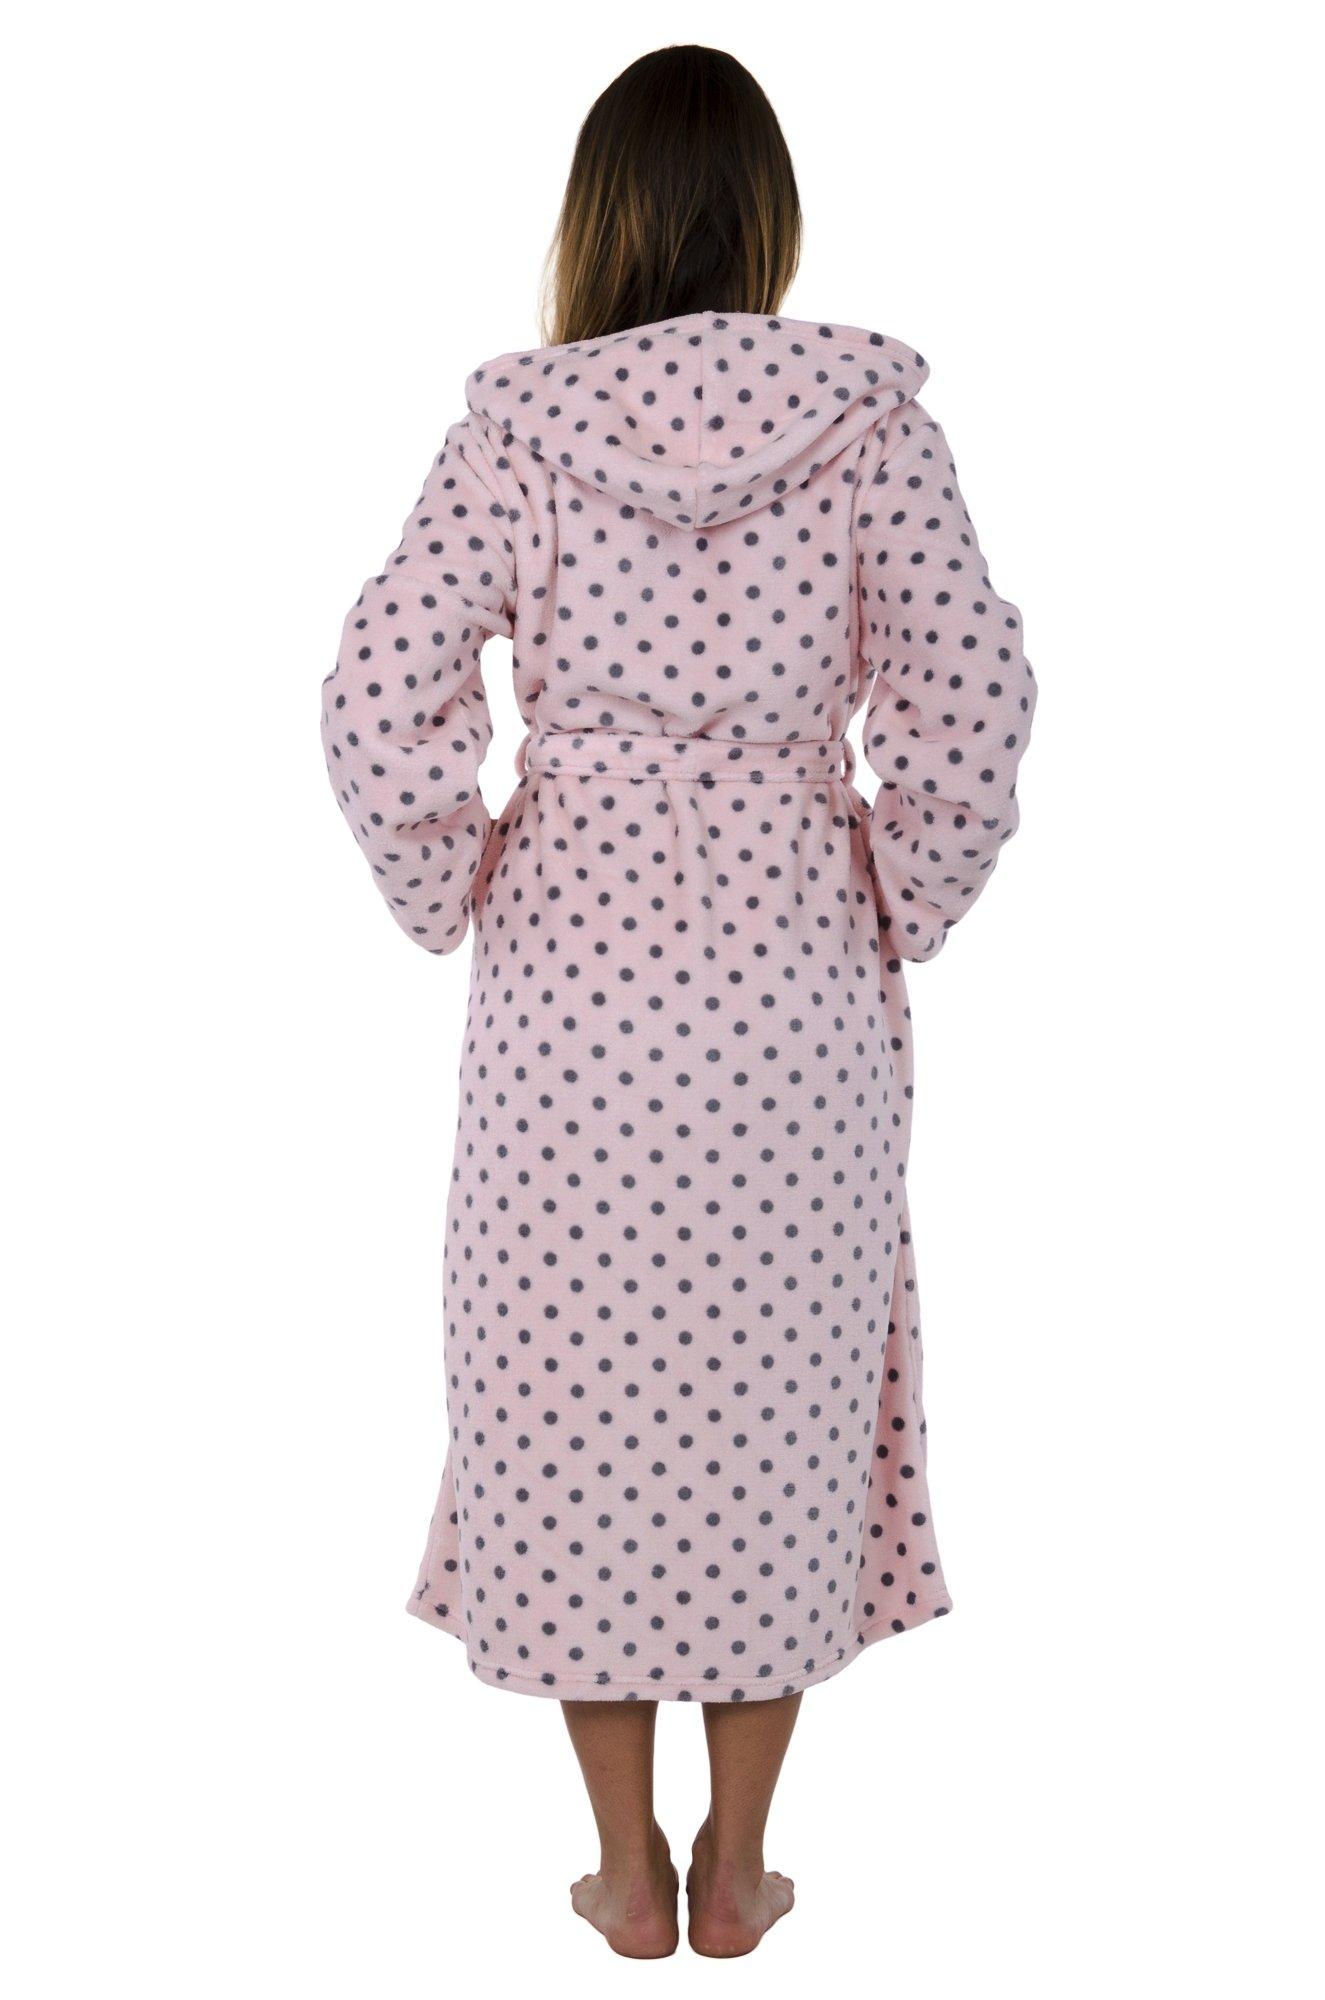 Hoodie Robe Hooded Robe Spa Bathrobe Hoody Robe Long Robe … (Large, Pink Polka Dot) by Love This Robe (Image #4)